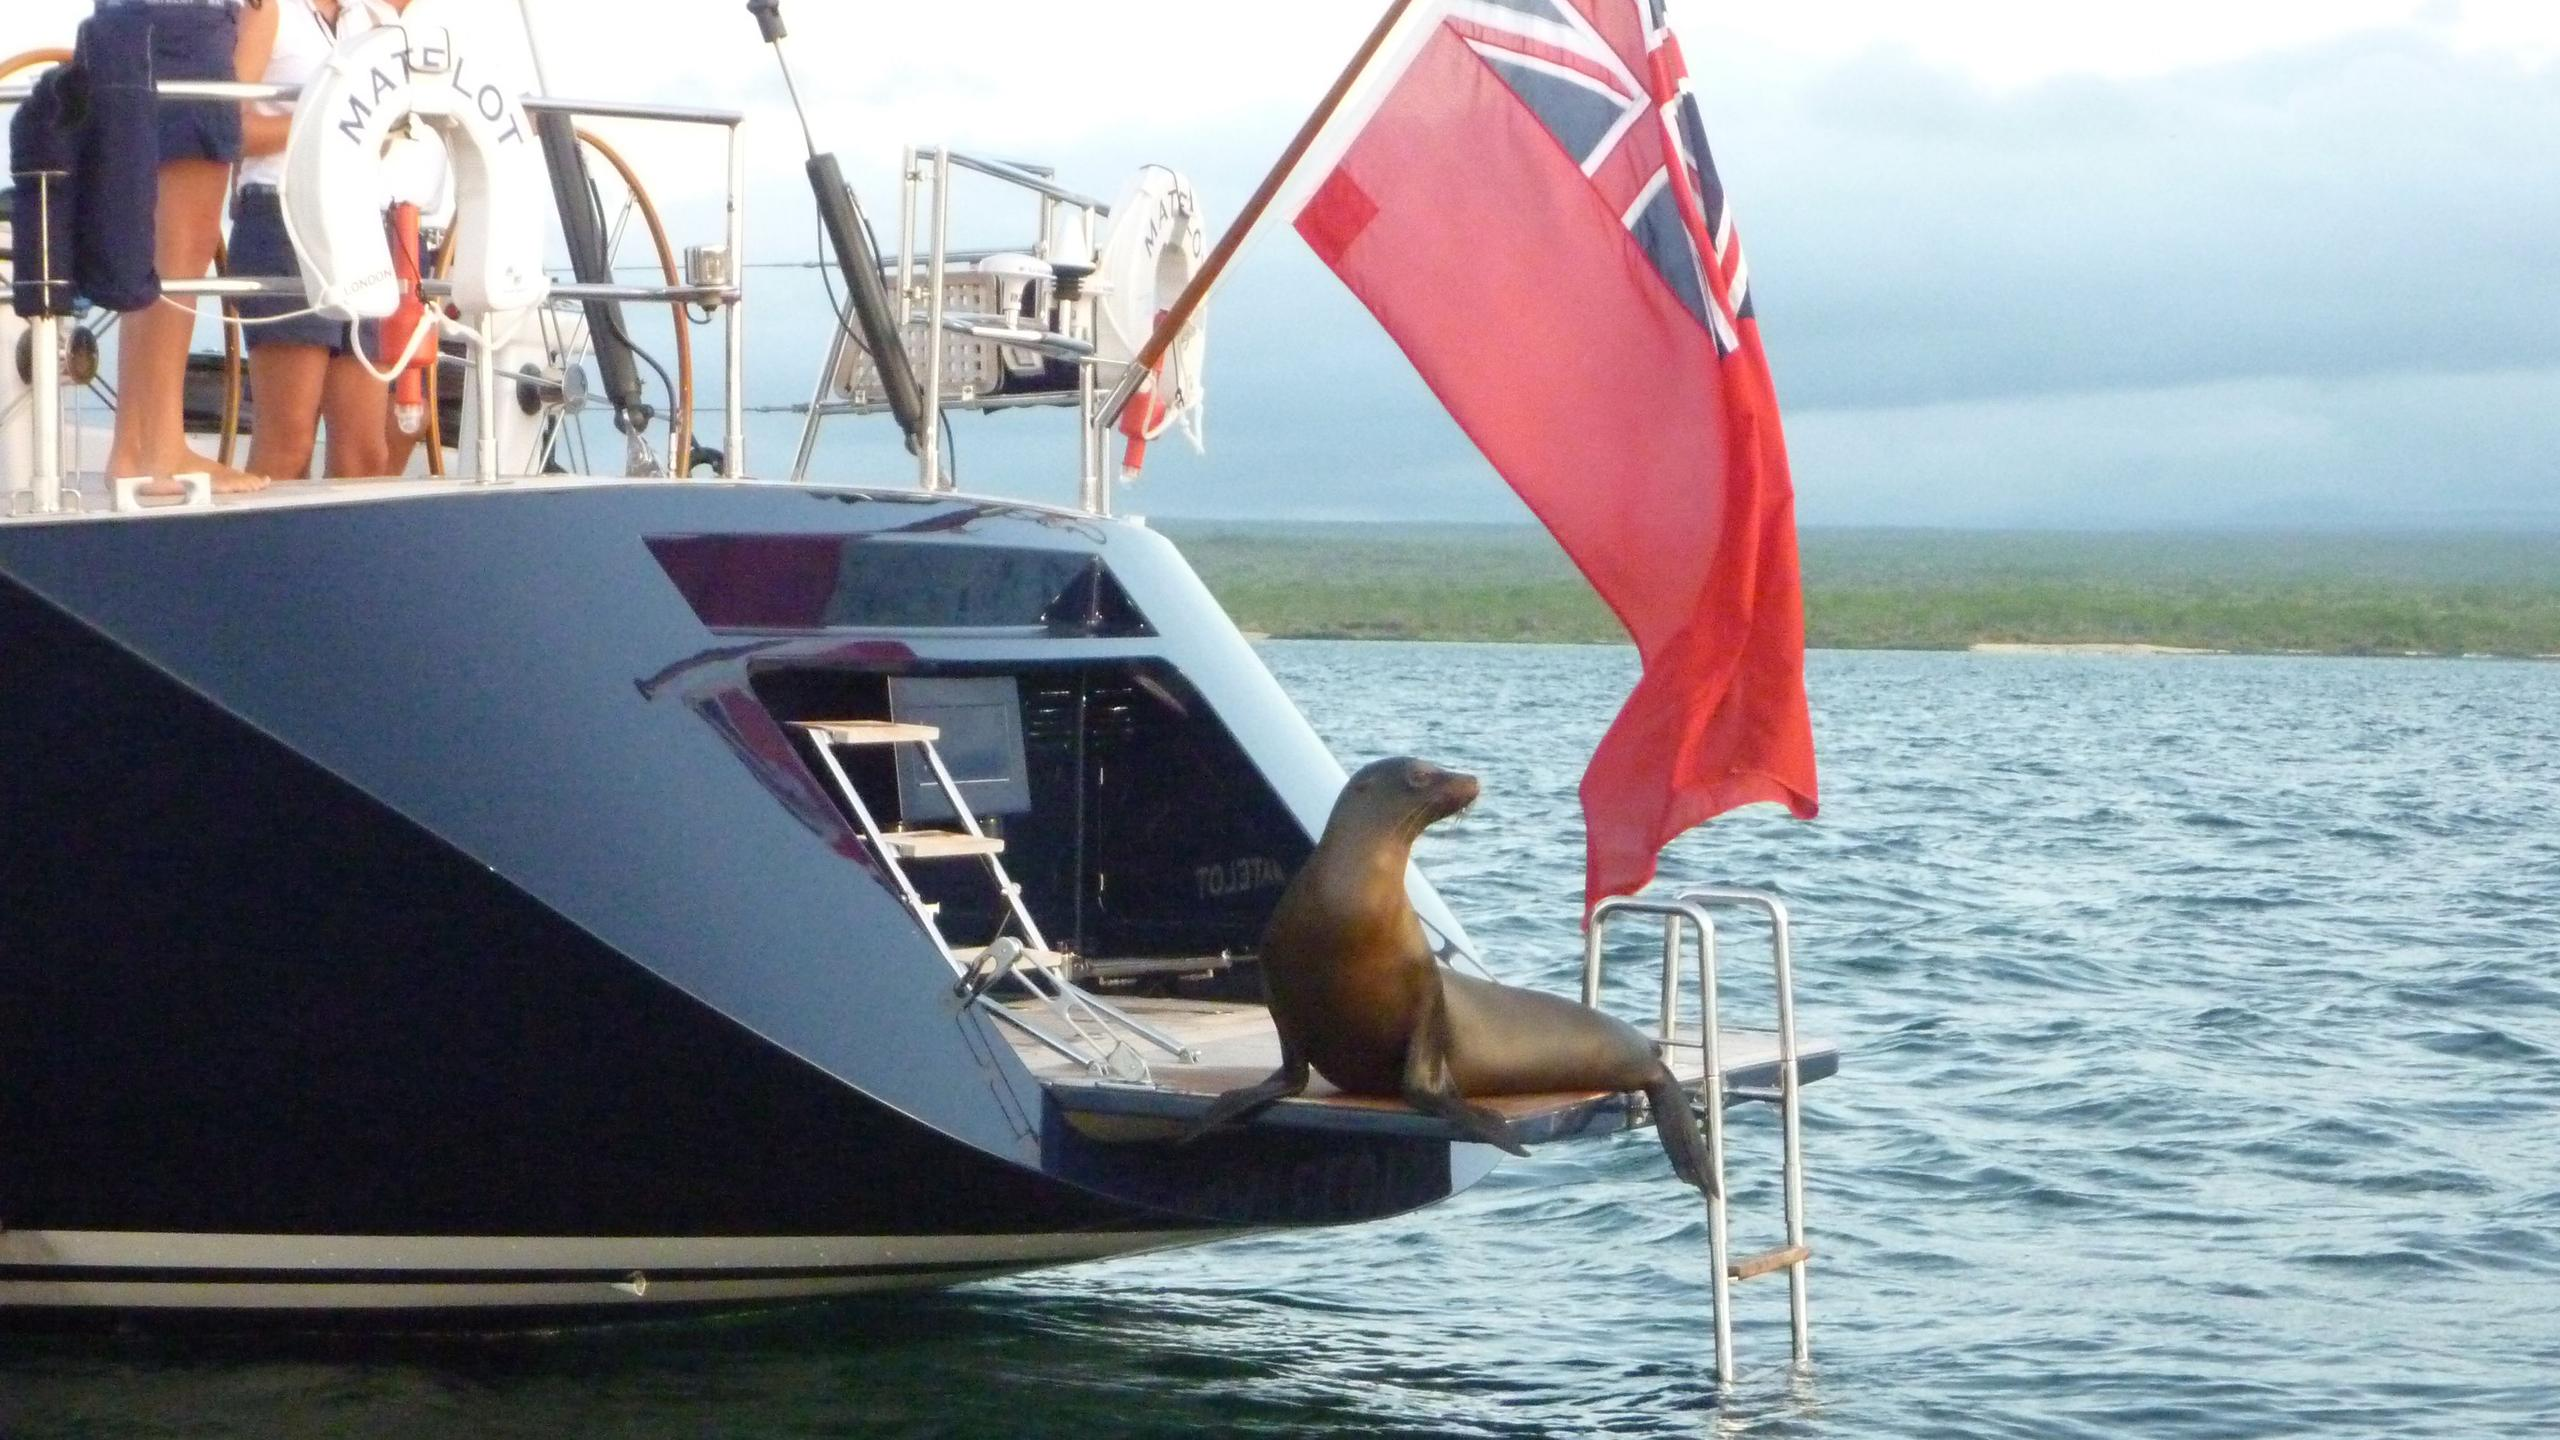 si vis pacem sailing yacht southern wind shipyard 24m 2005 stern